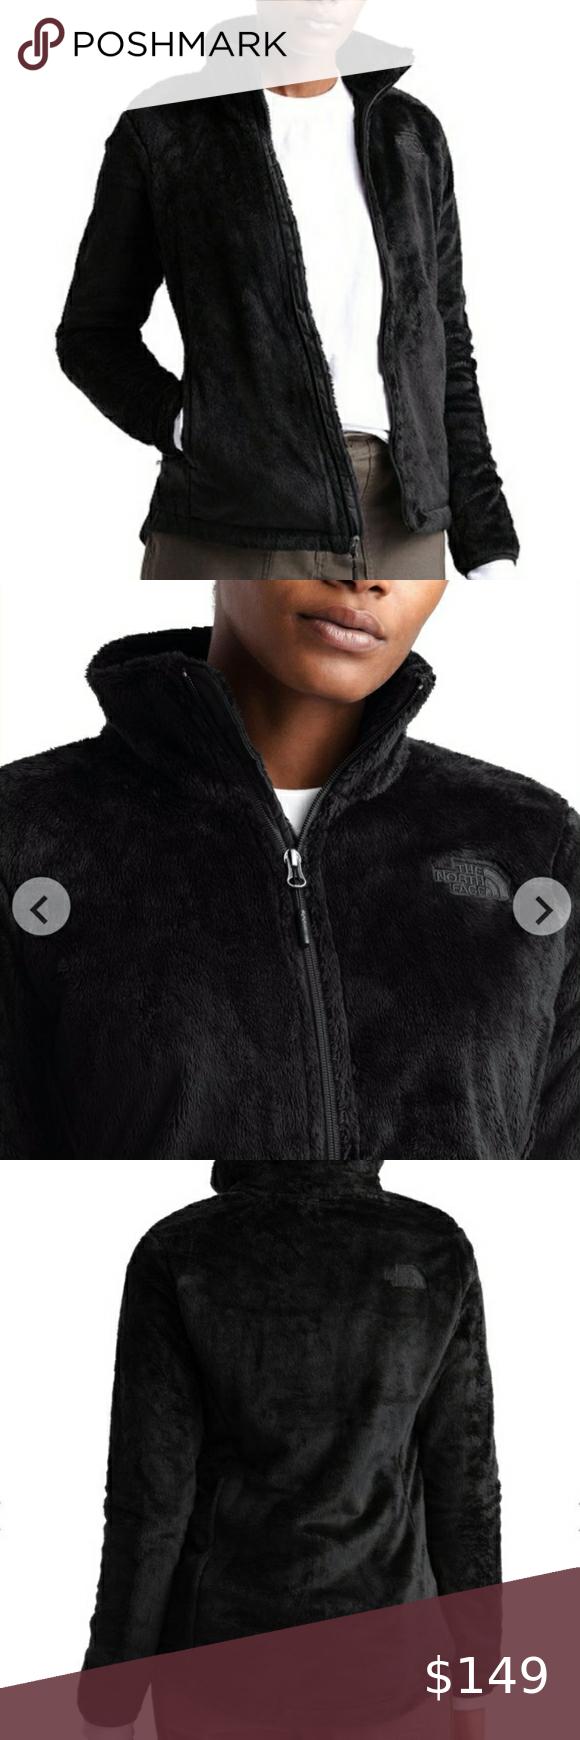 The North Face Osito Black Jacket Xxxl 3x In 2020 Black Jacket Fashion Clothes Design [ 1740 x 580 Pixel ]